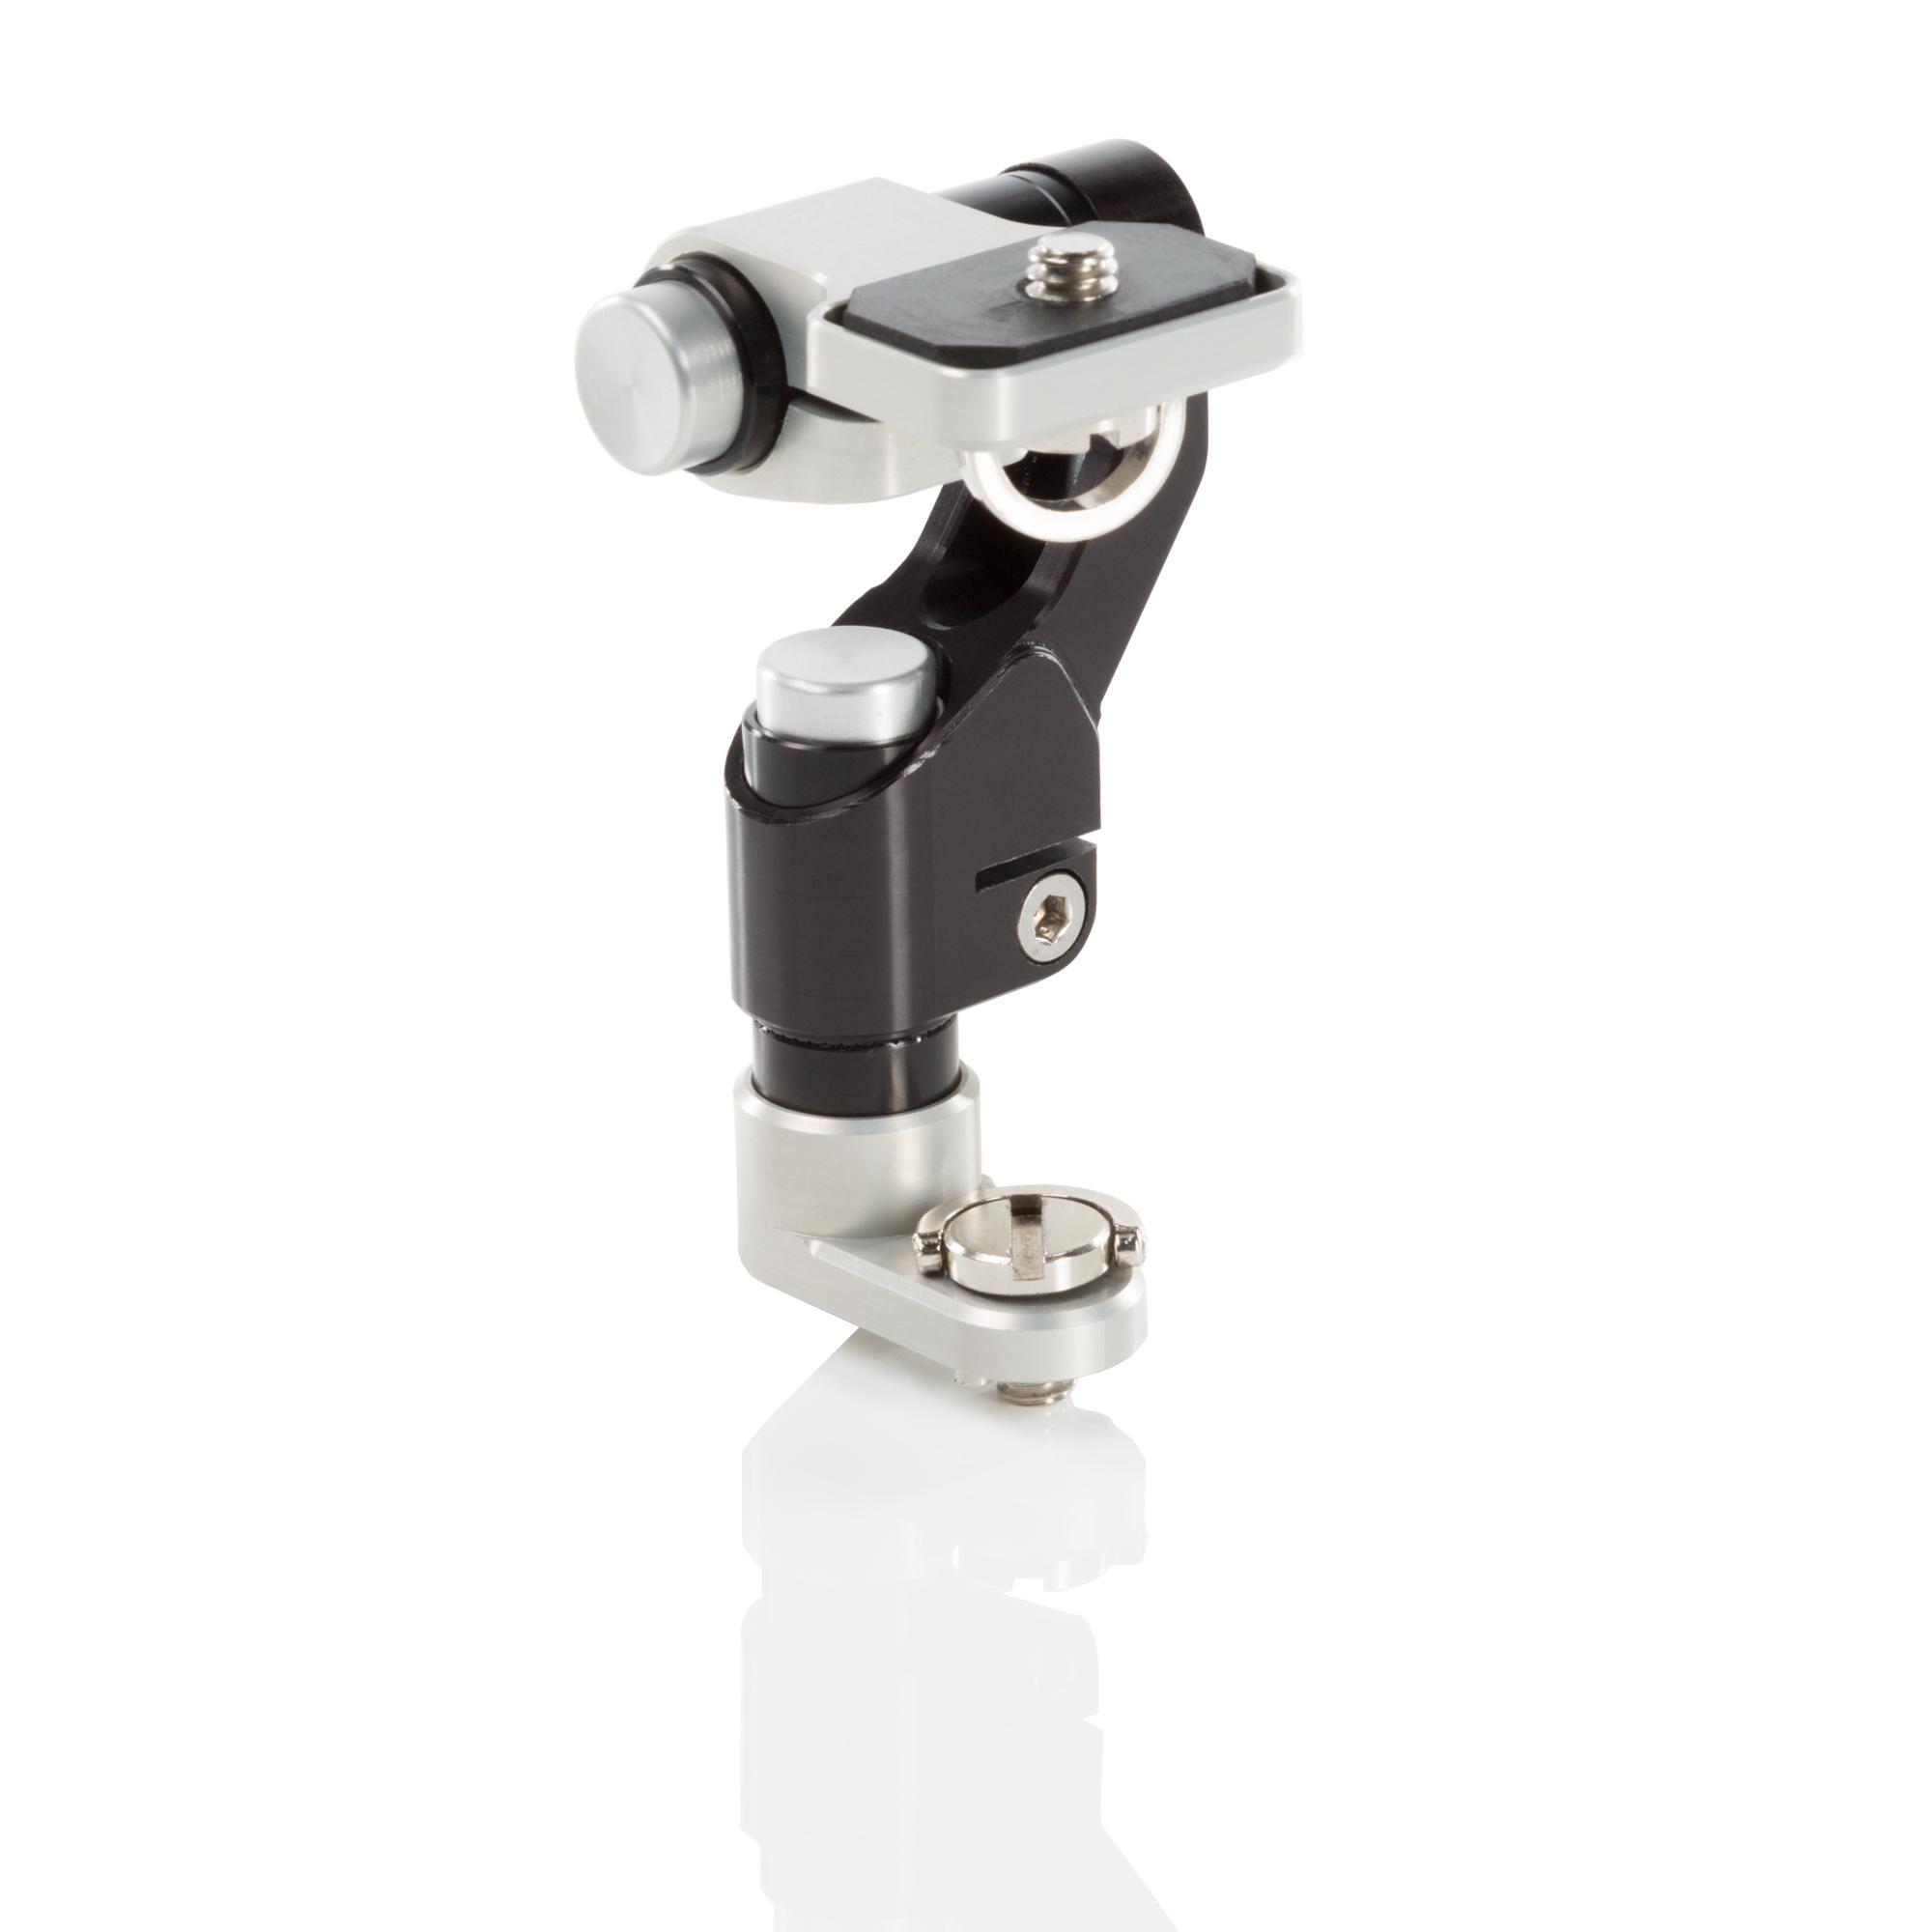 RPB2A 2 axis push button arm